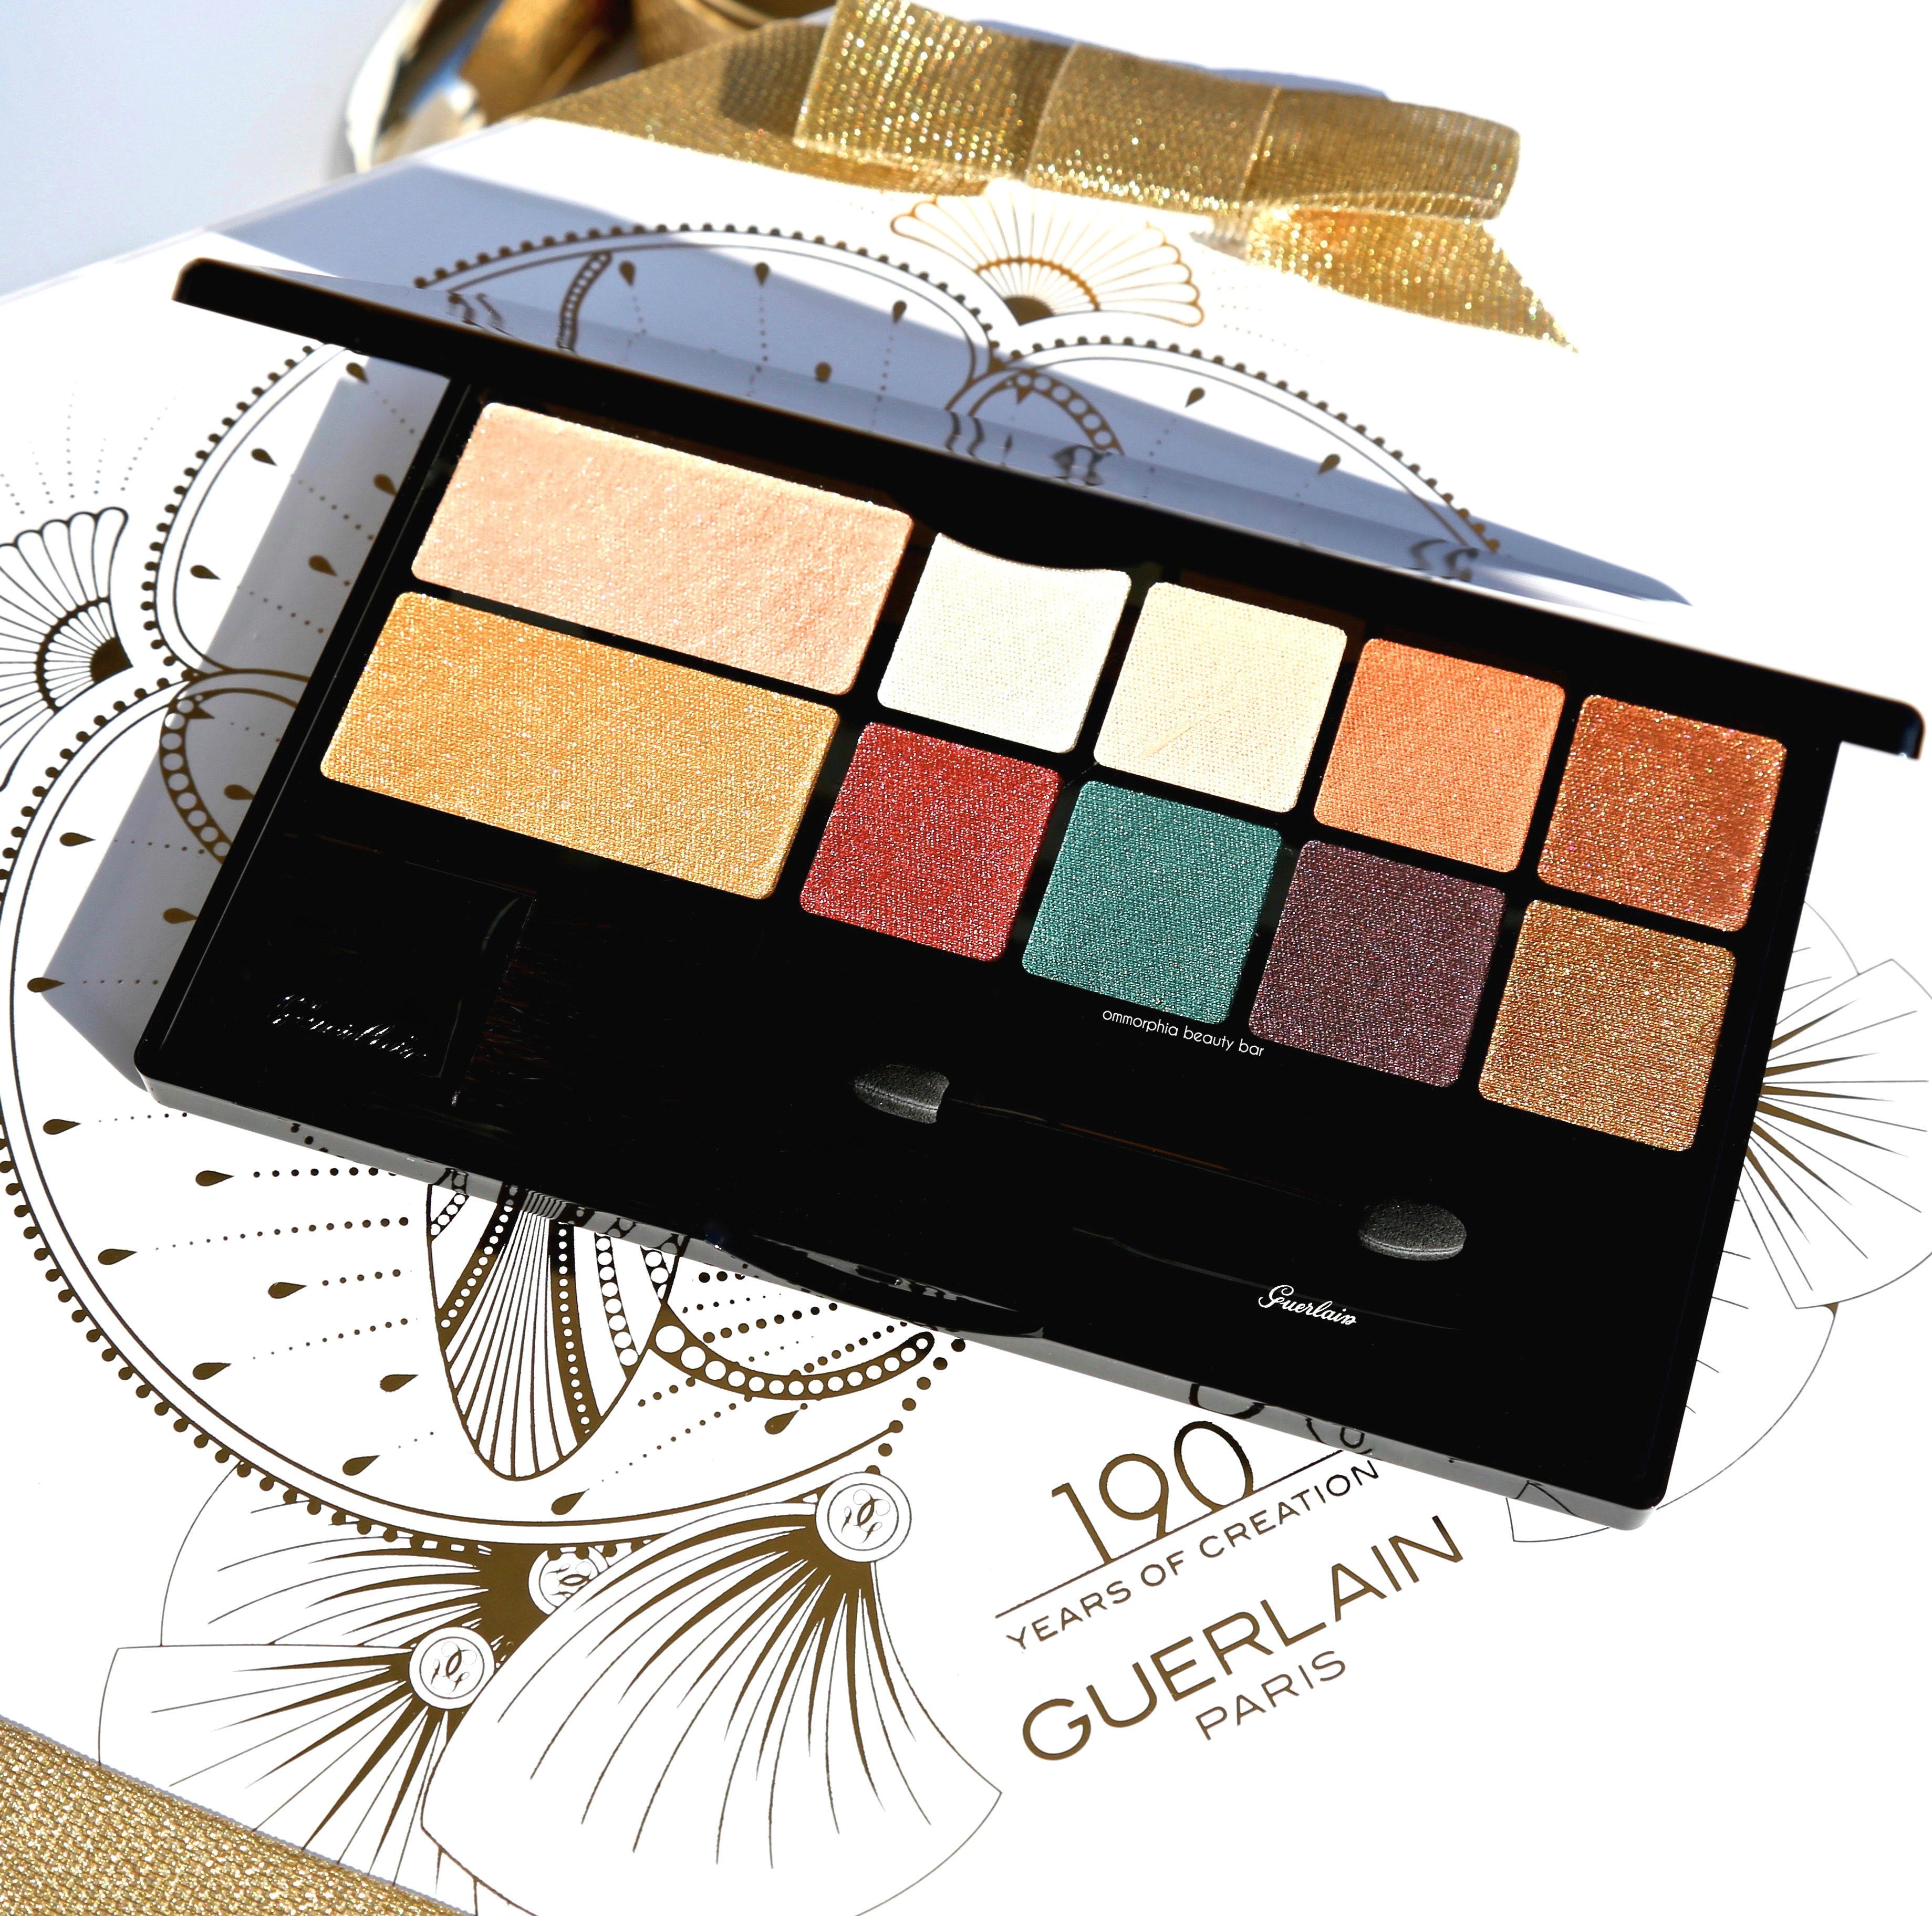 CollectionOmmorphia Beauty Bar · 2018 Holiday Guerlain 8OknP0w